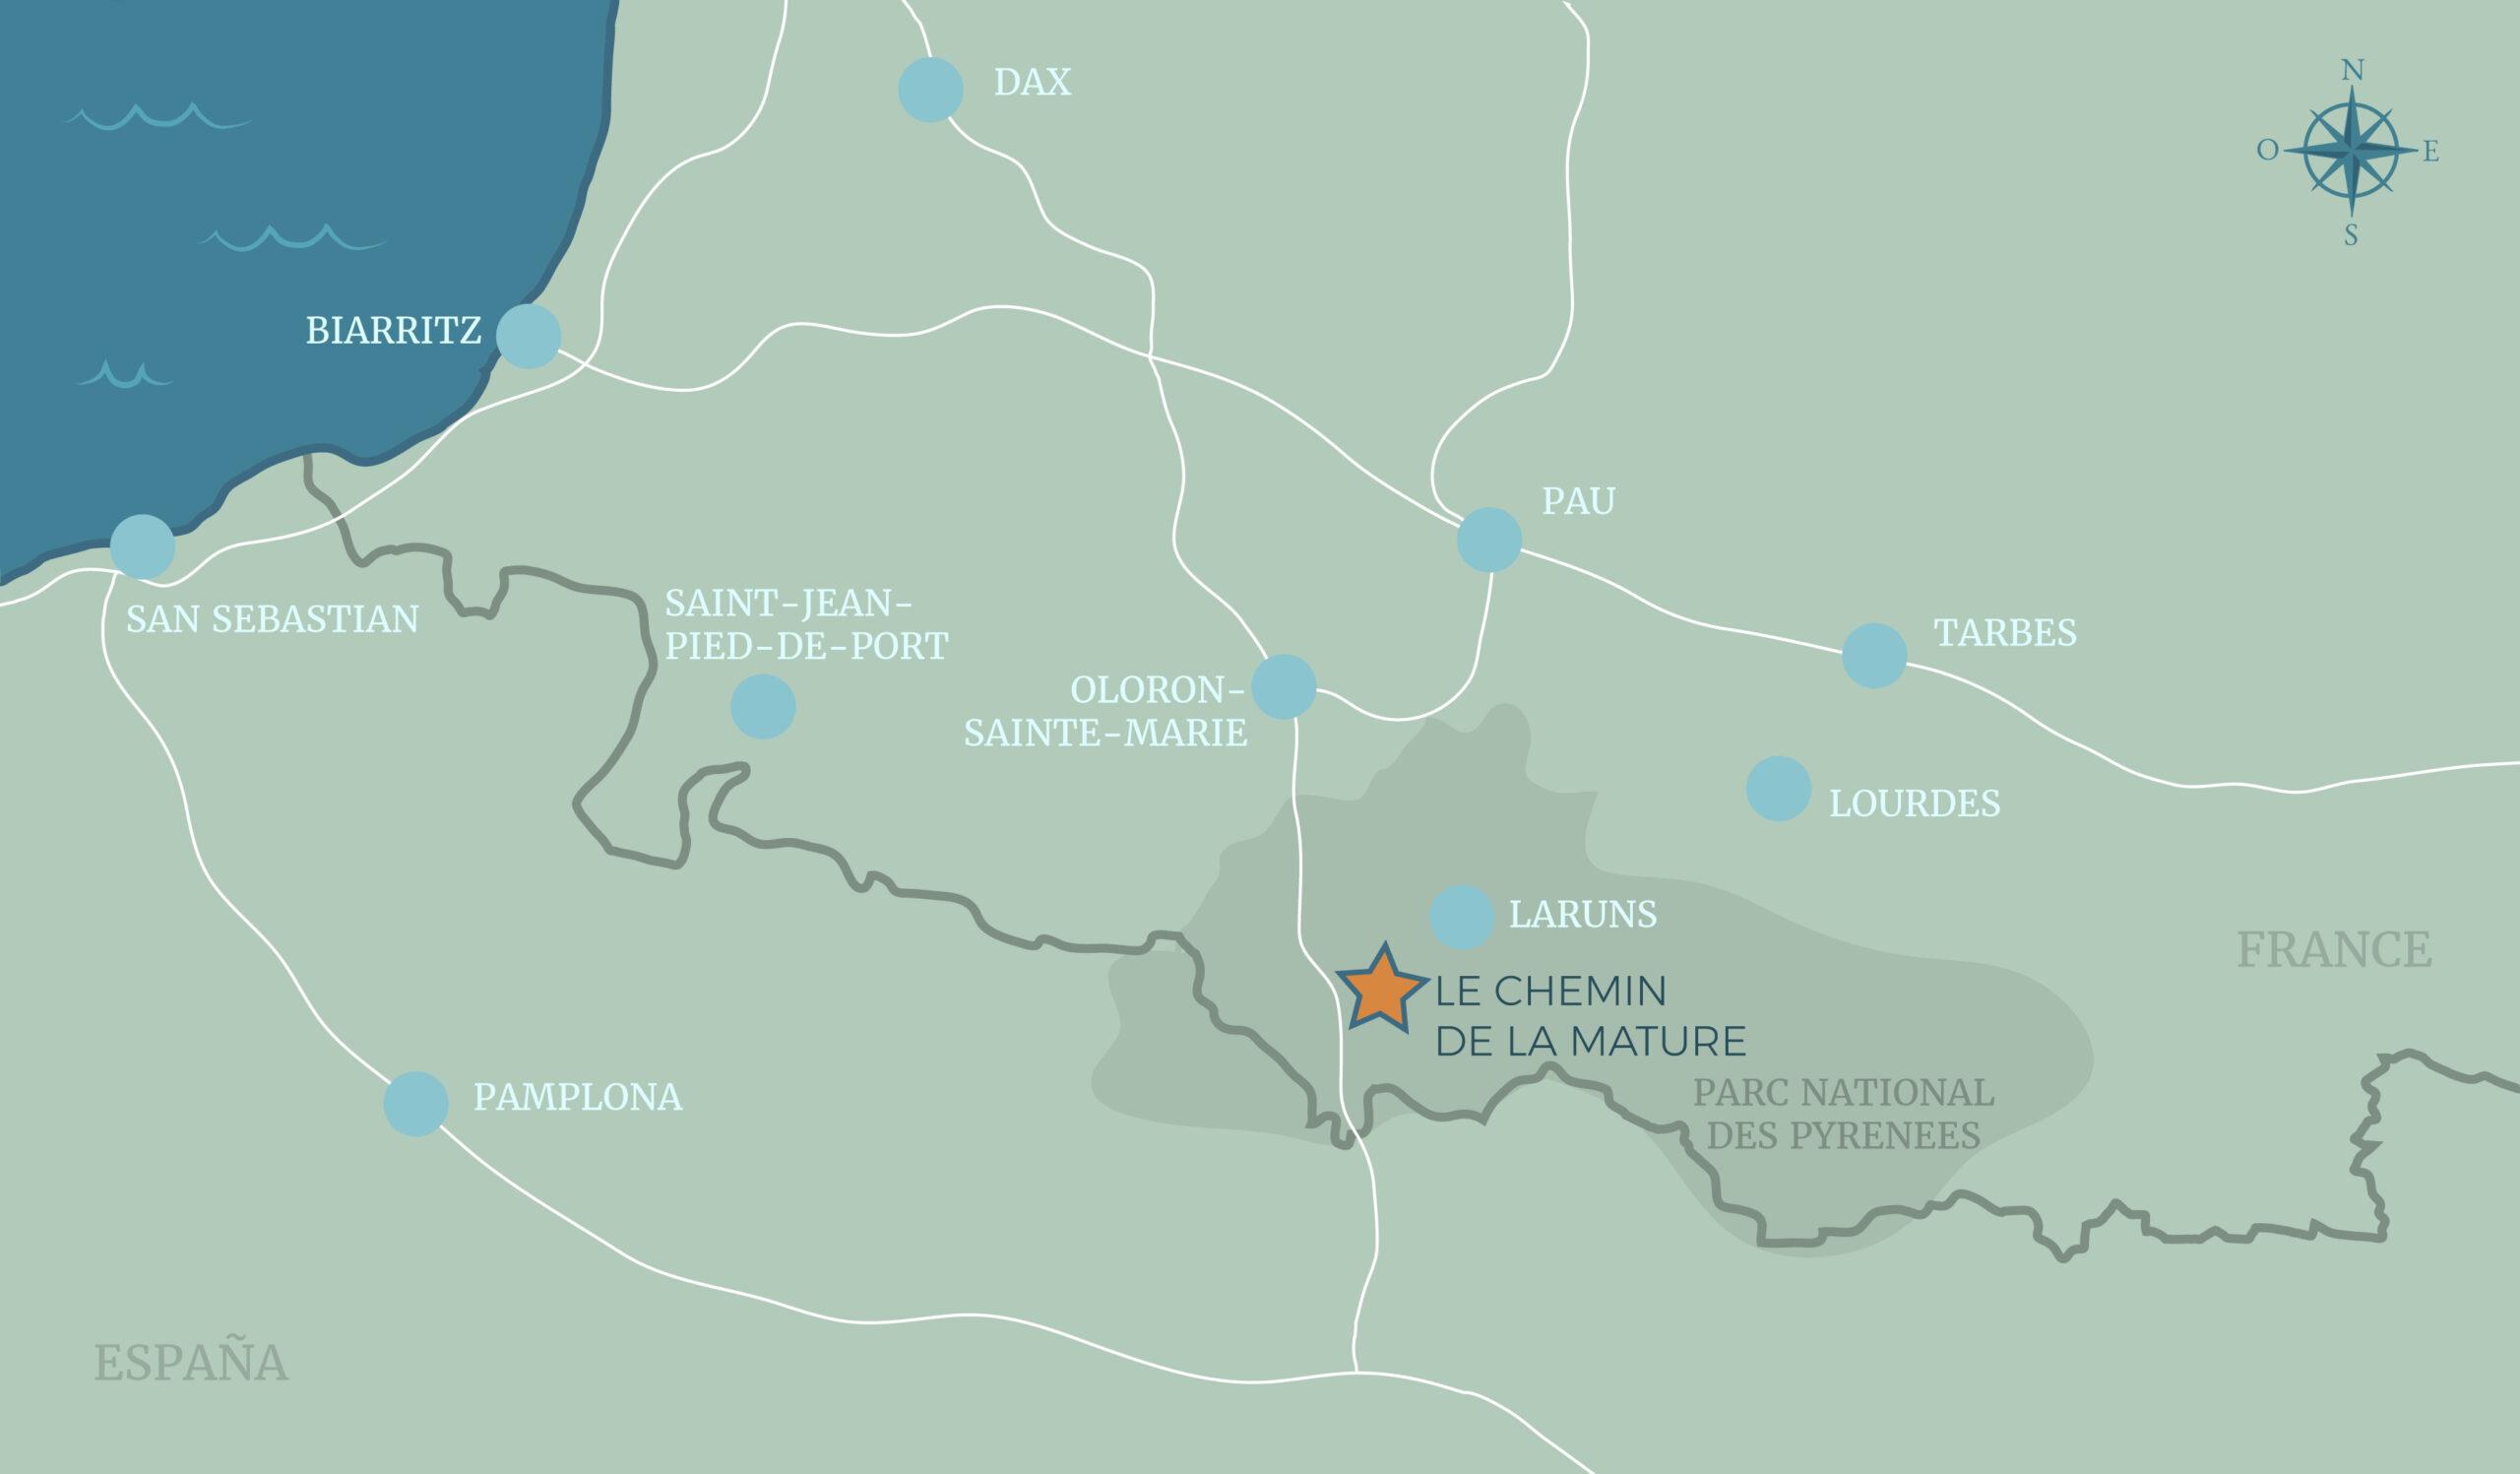 carte pyrenees localisation chemin mature